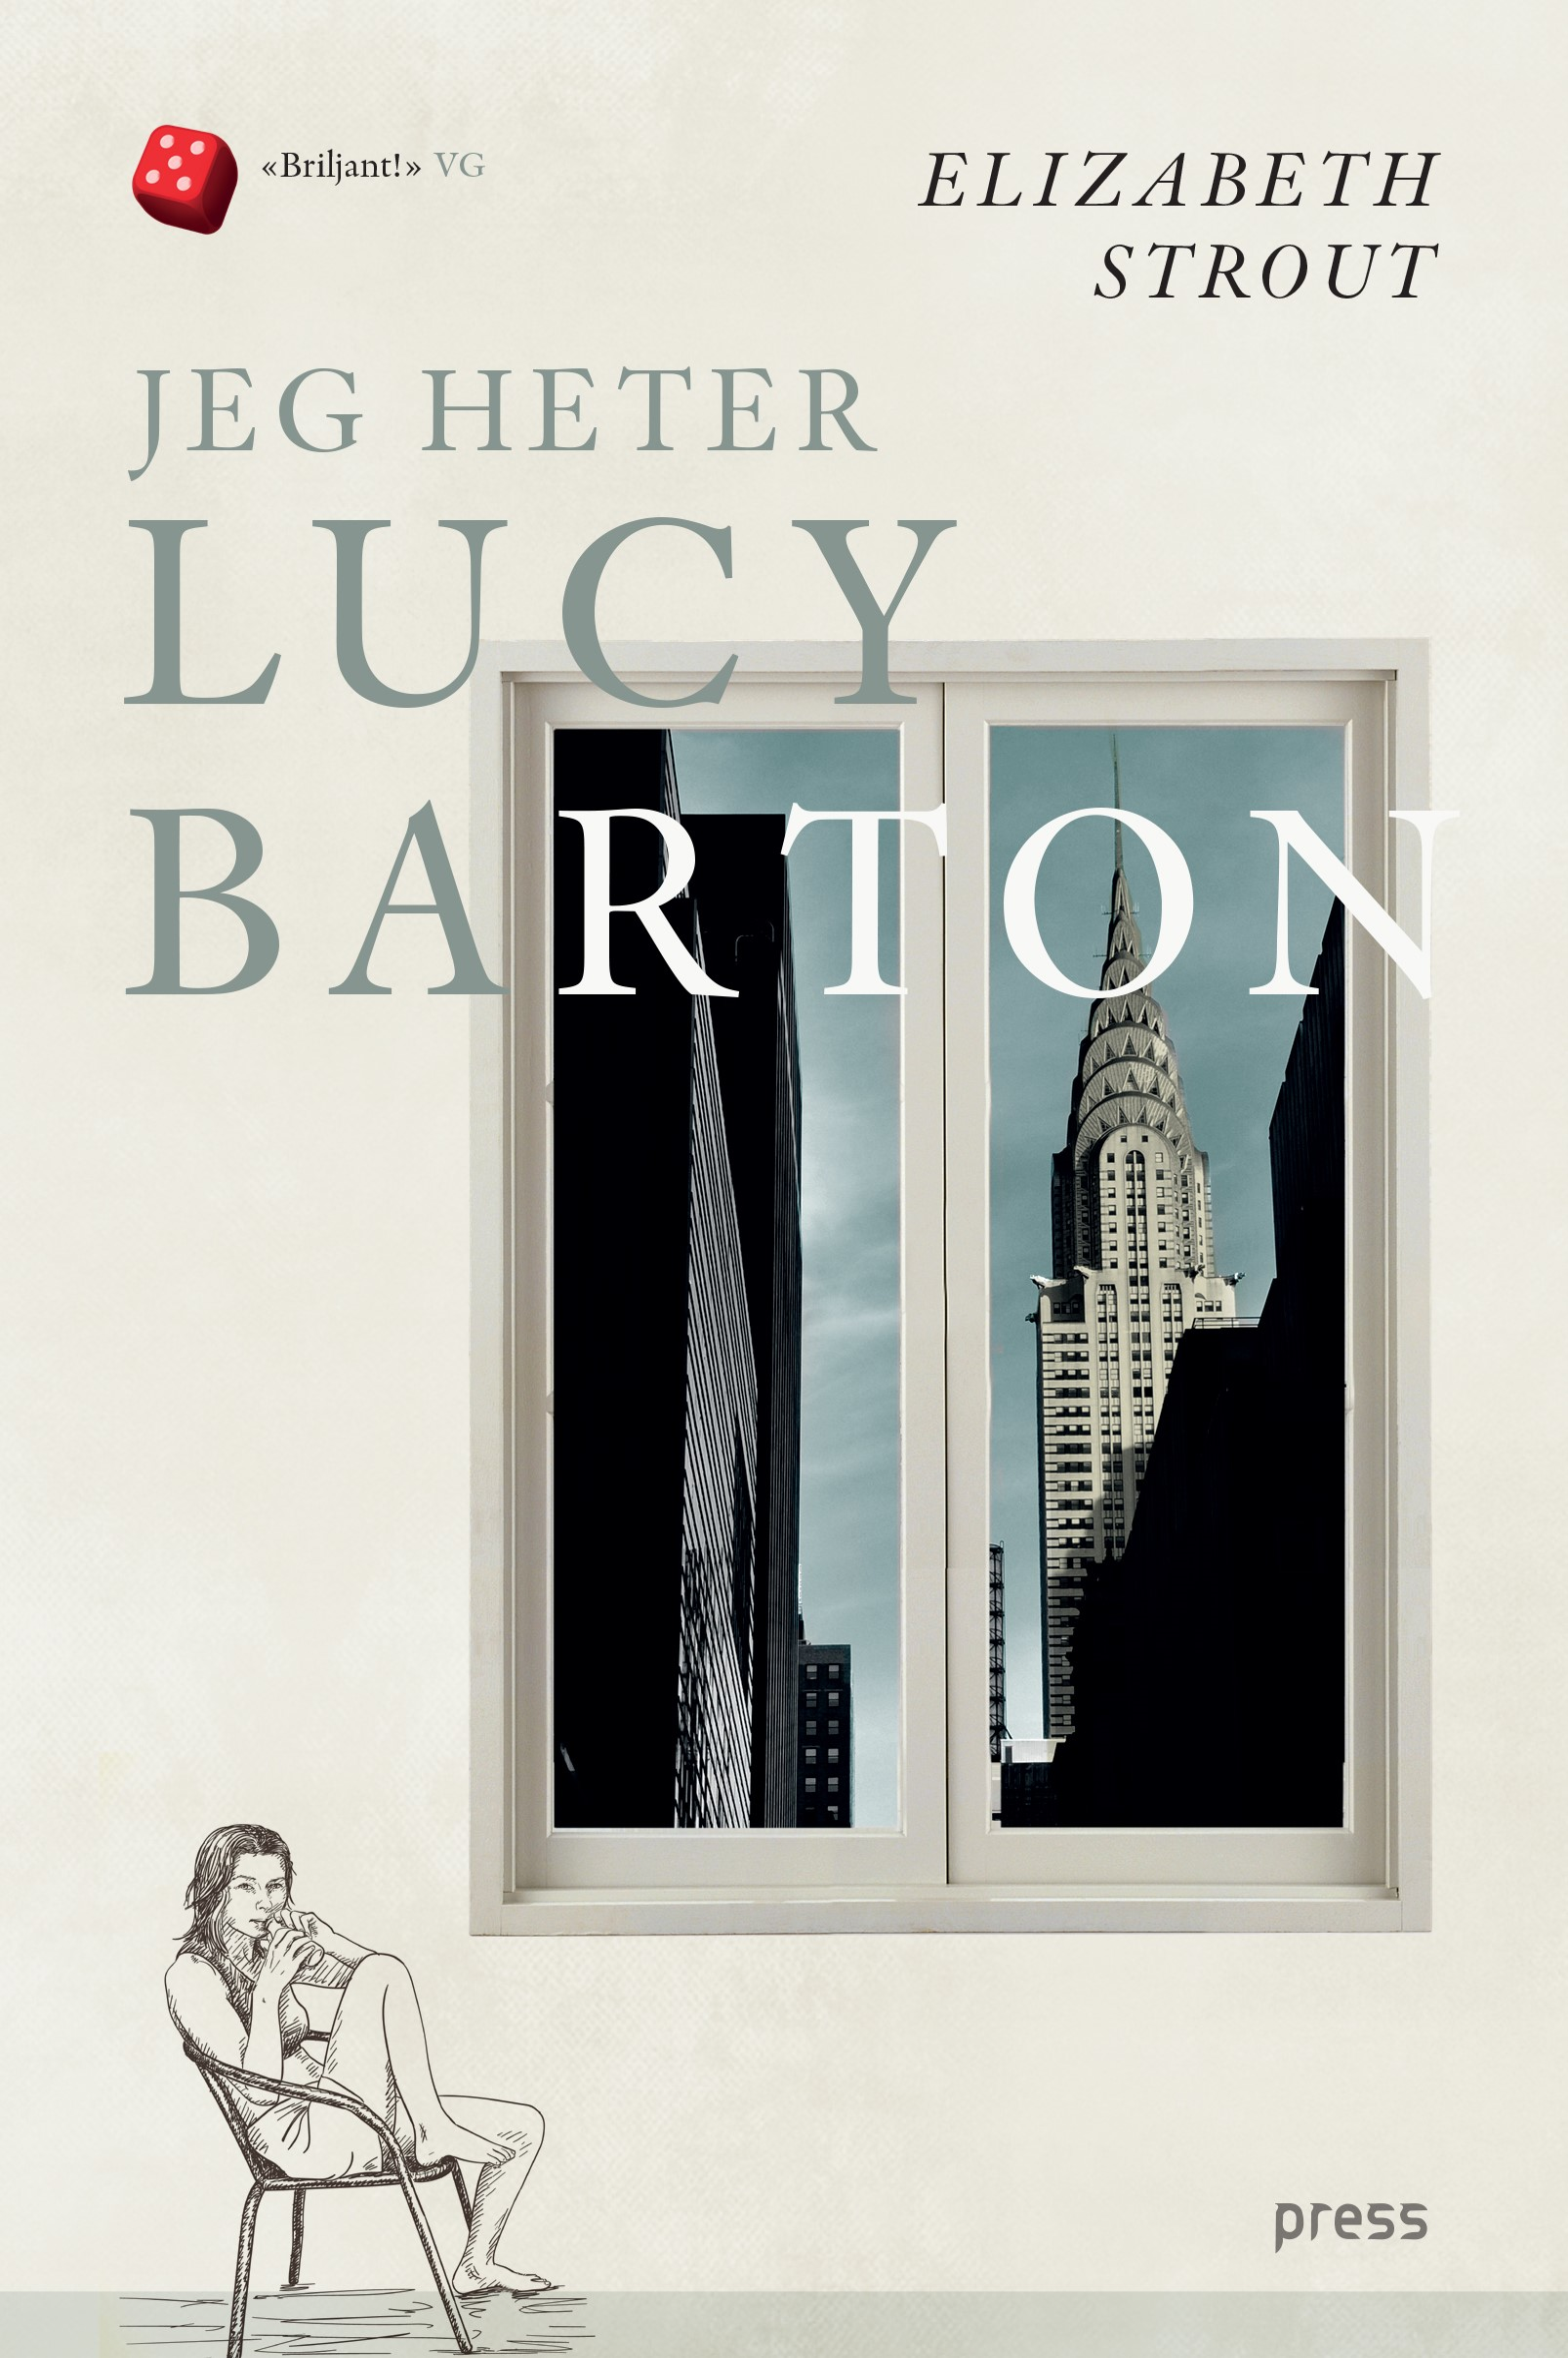 Jeg heter lucy barton pocket